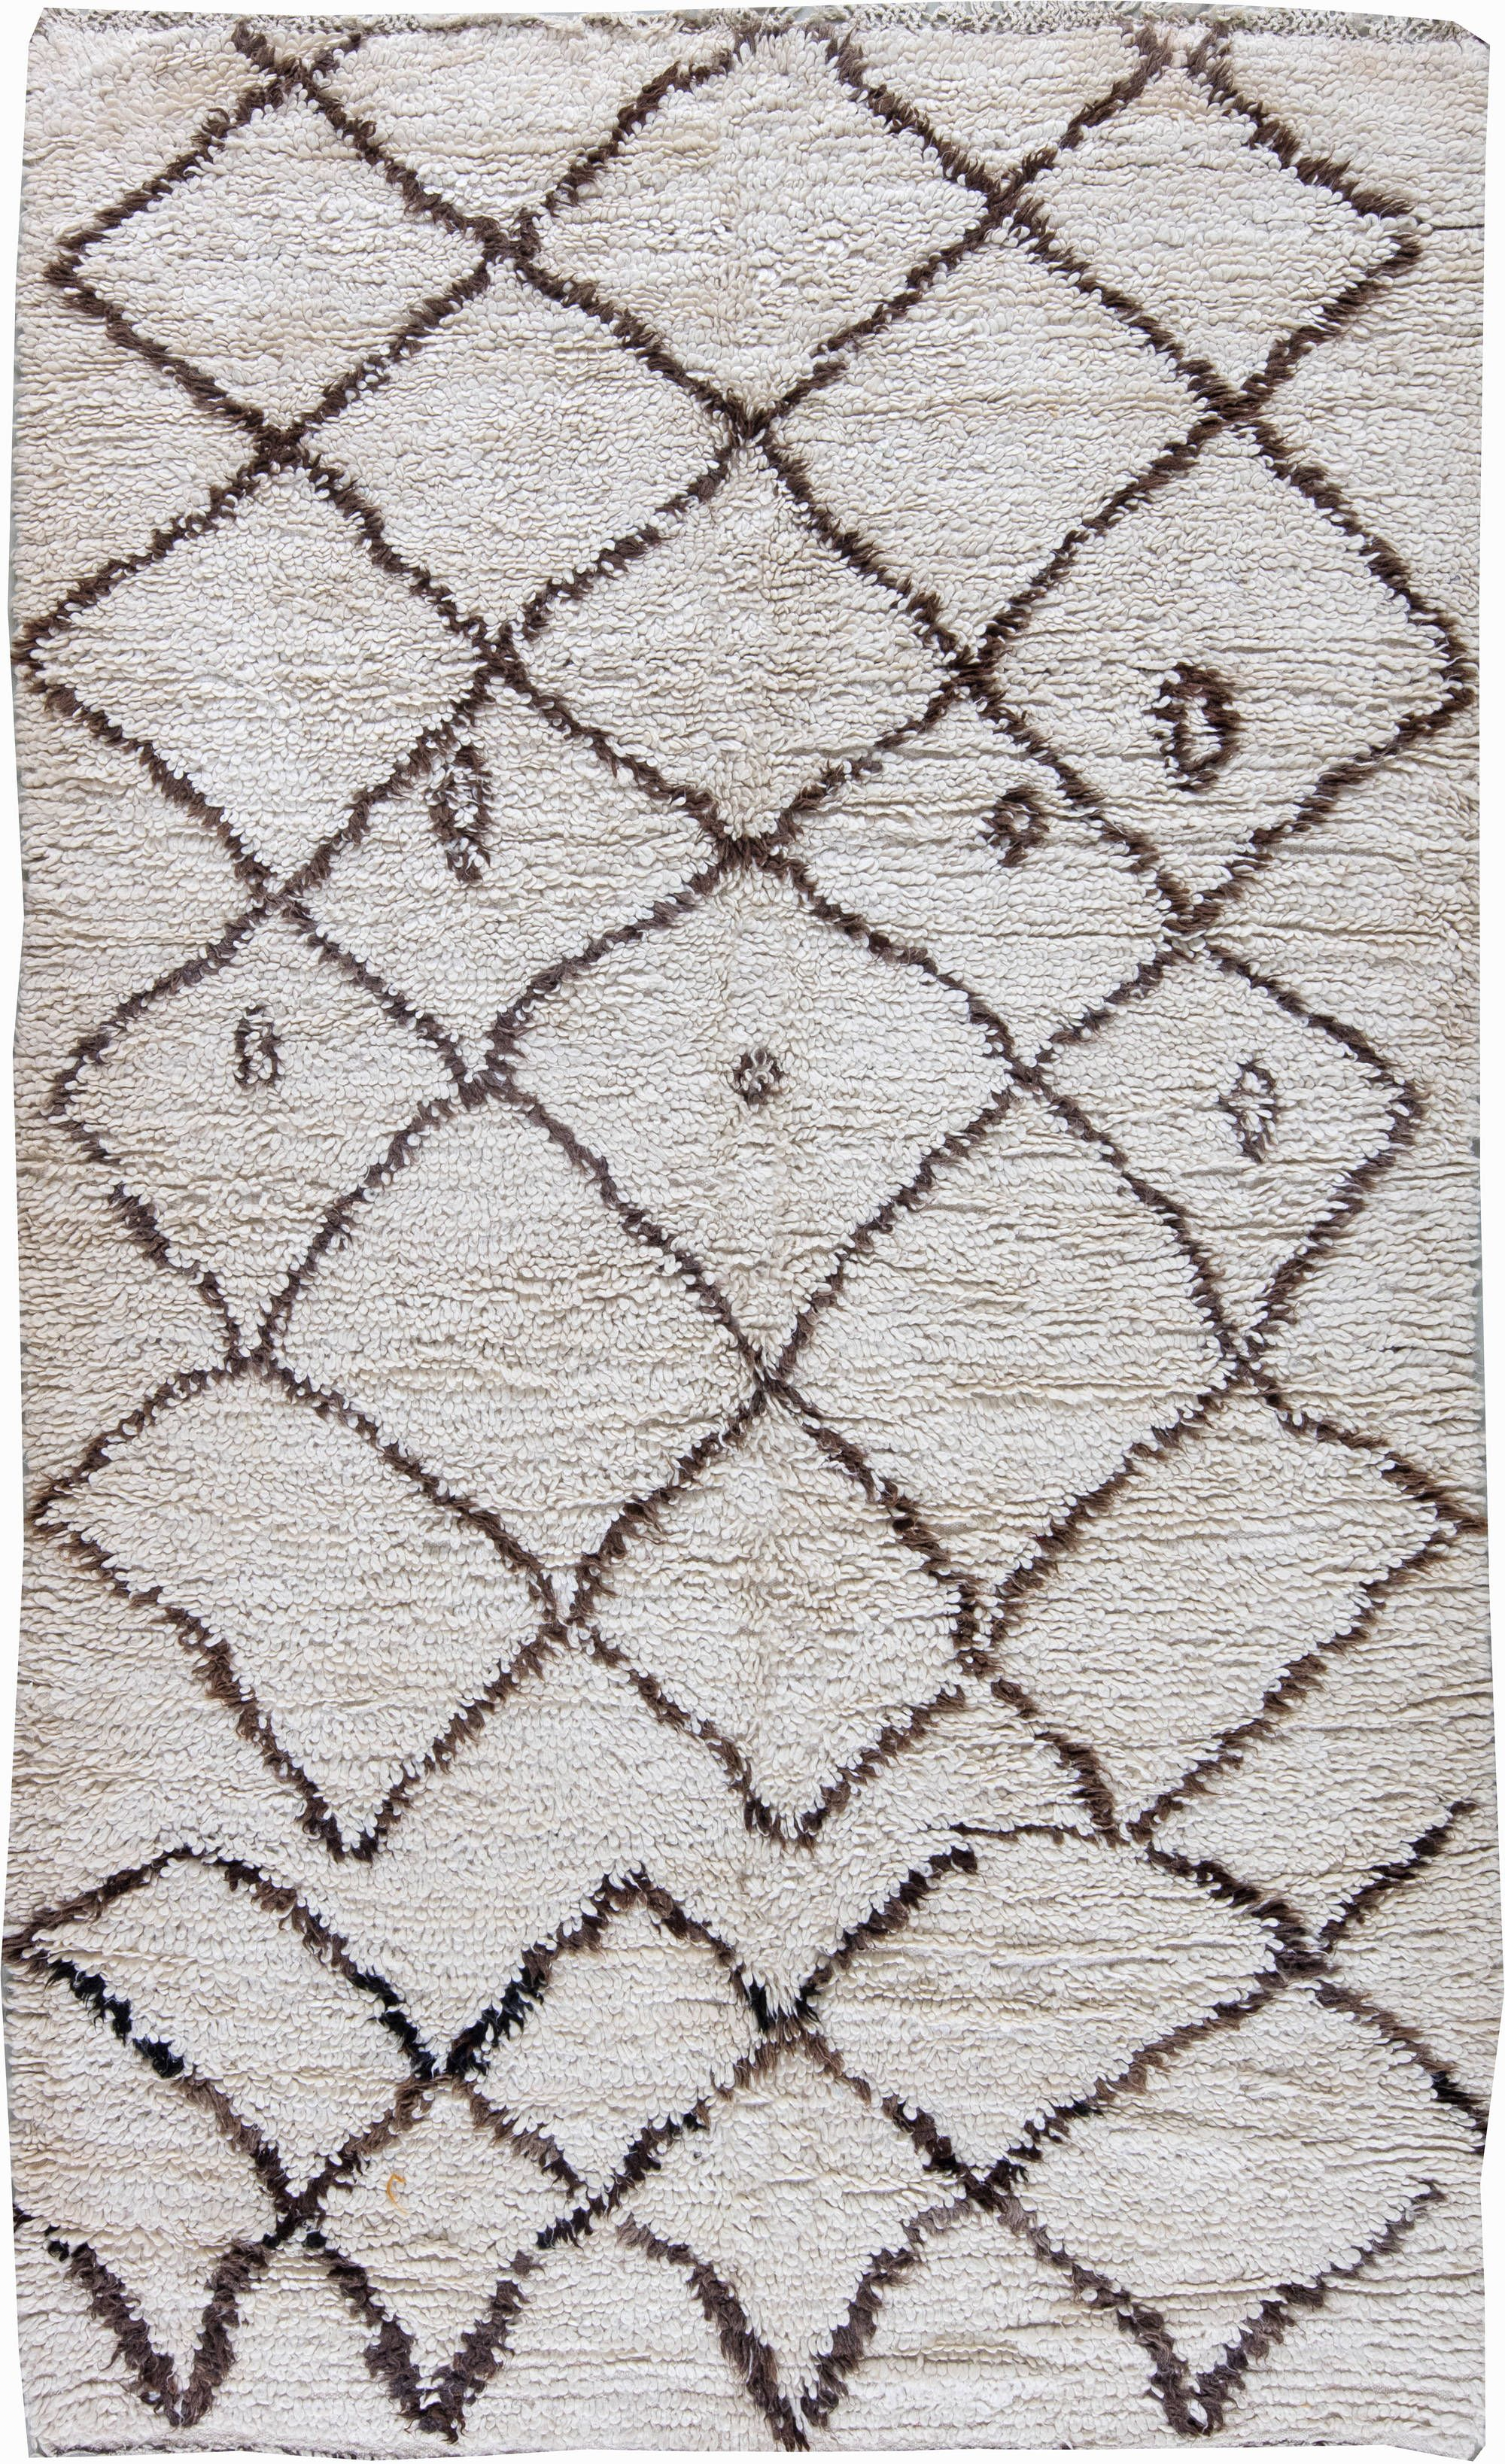 Moroccan Rugs Rug For Vintage Living Room Bohemian Interior Decor Boho